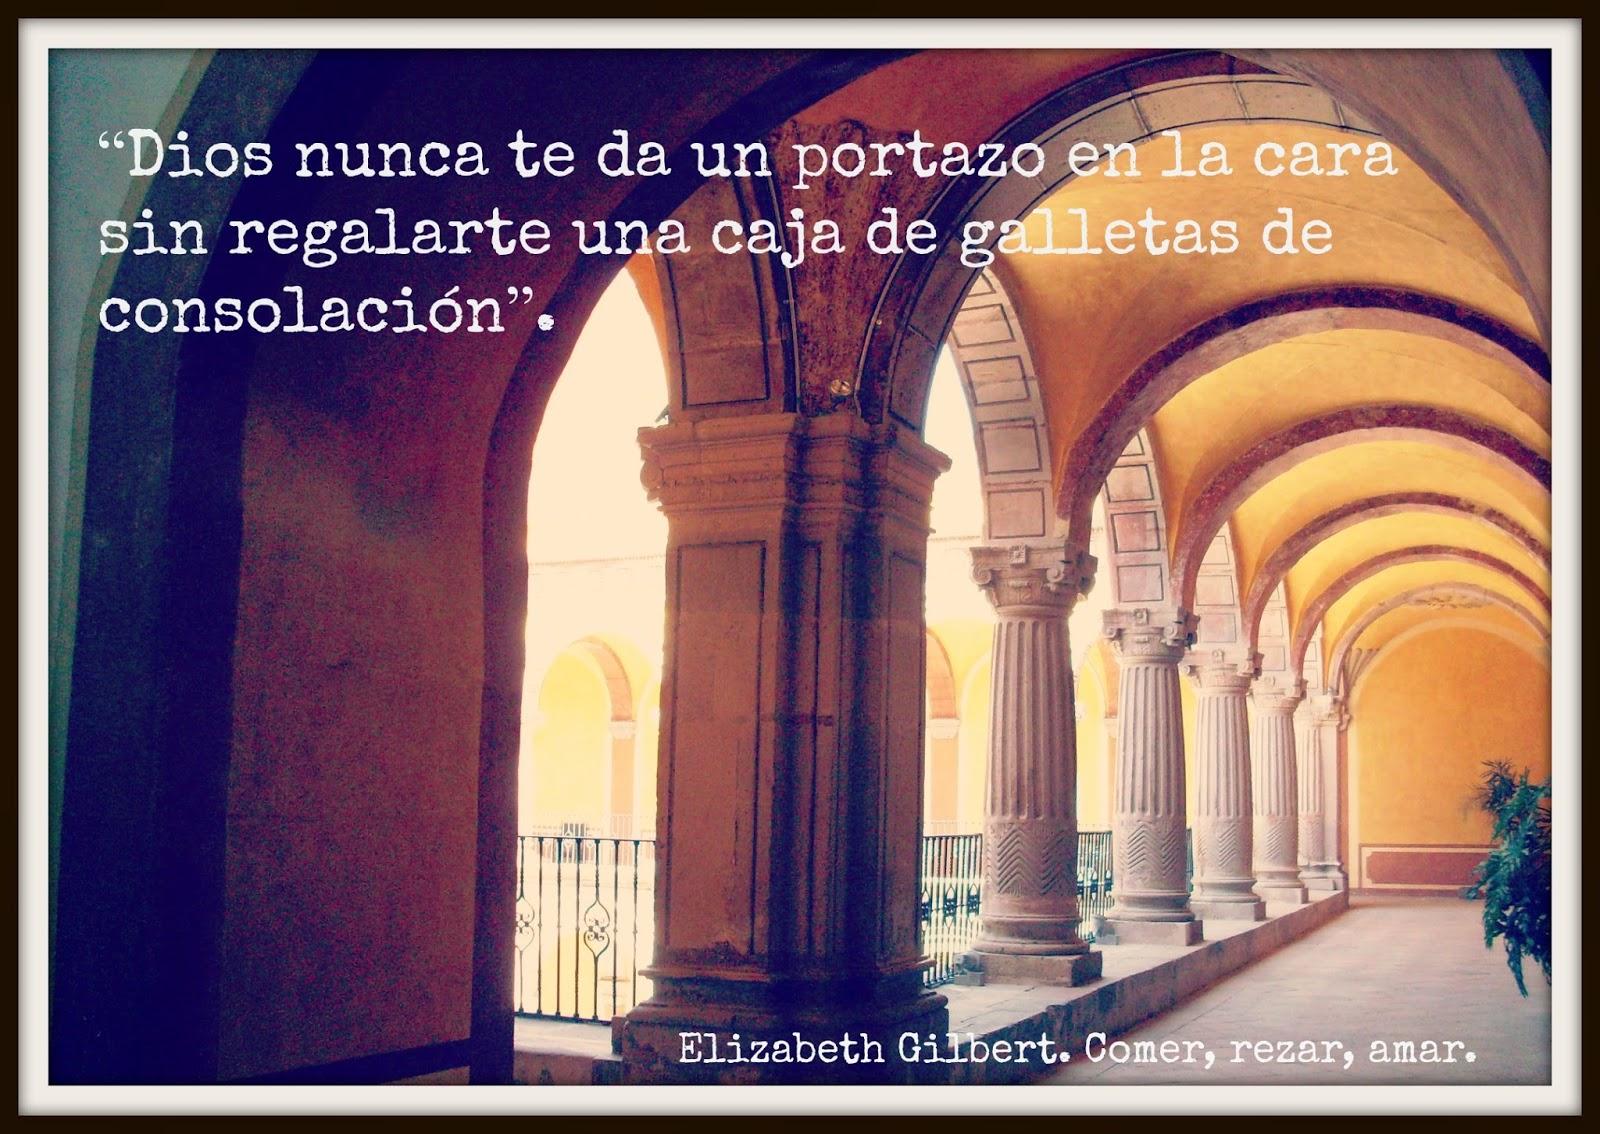 Frases De Elizabeth Gilbert Autora De Comer Rezar Amar